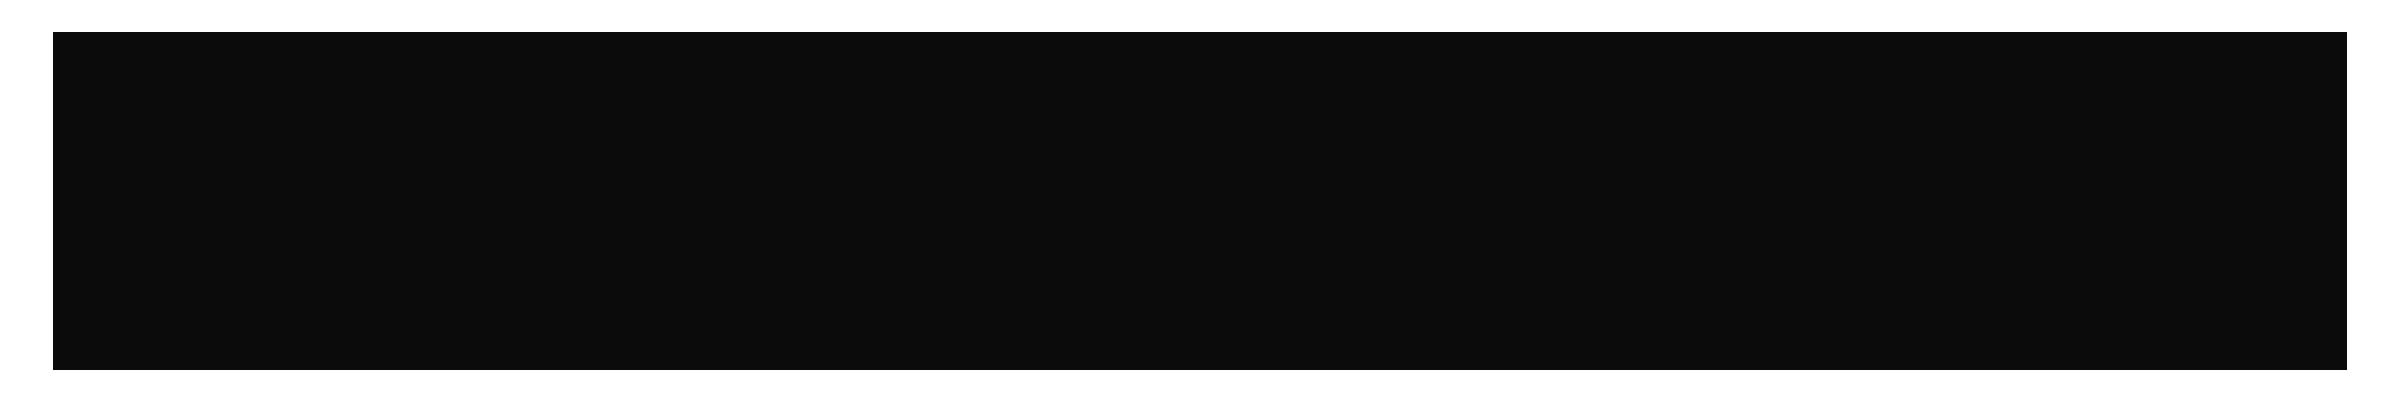 peachfuzz_logotype